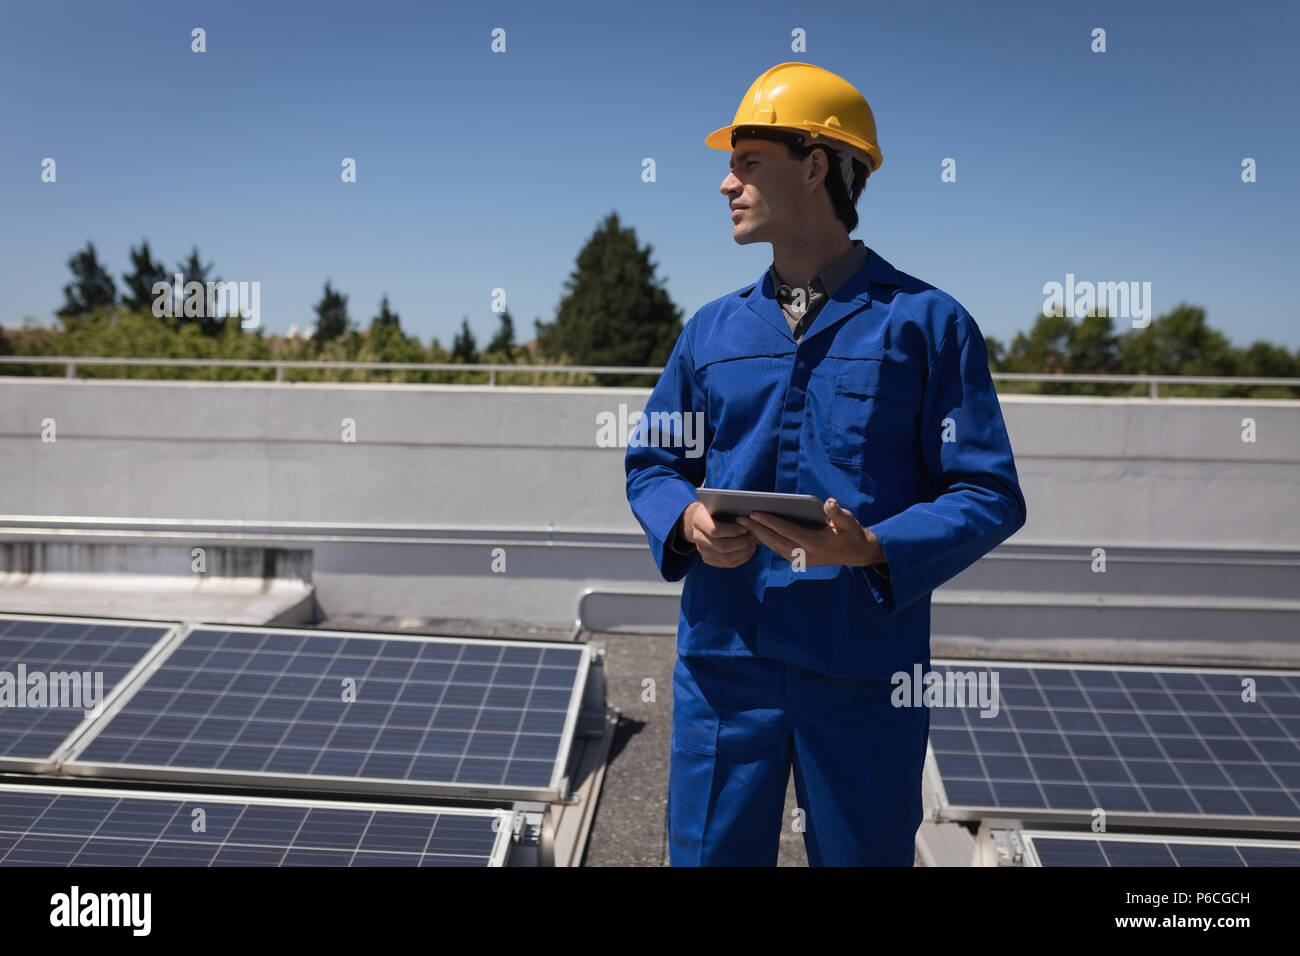 Travailleur homme using digital tablet at station solaire Banque D'Images